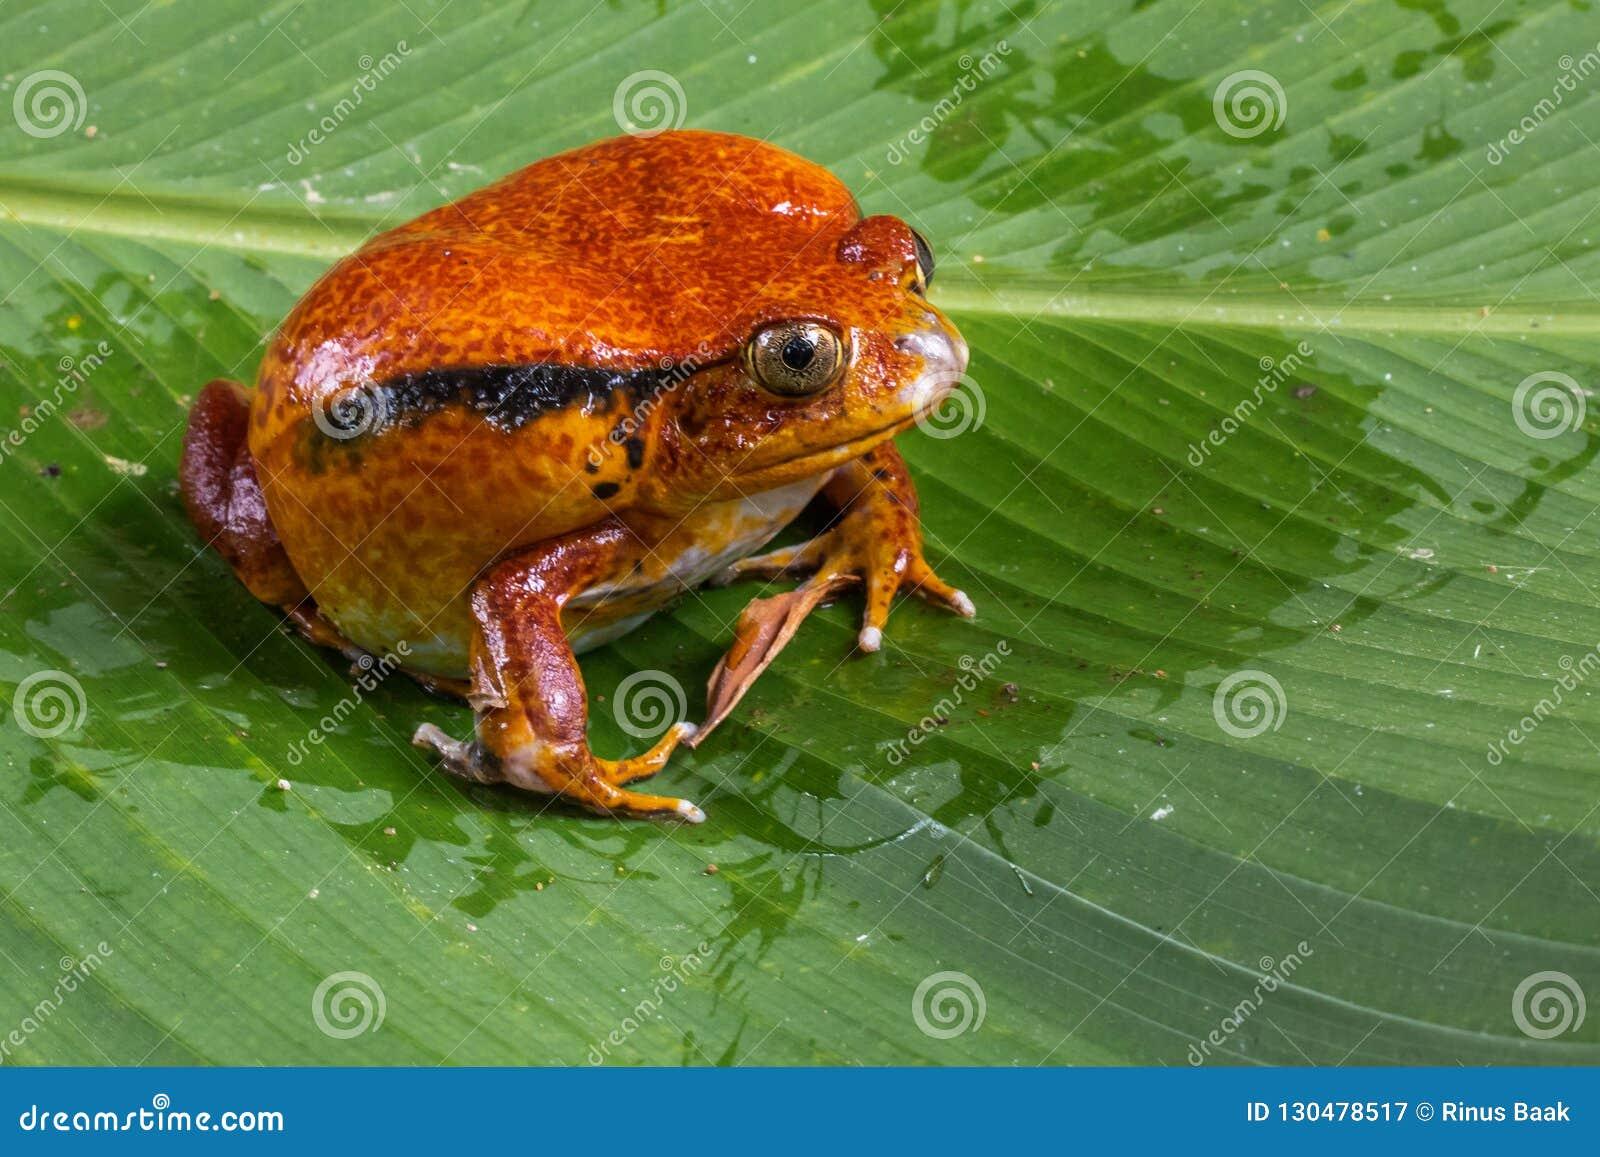 Lateinischer Name - Dicophus antongili